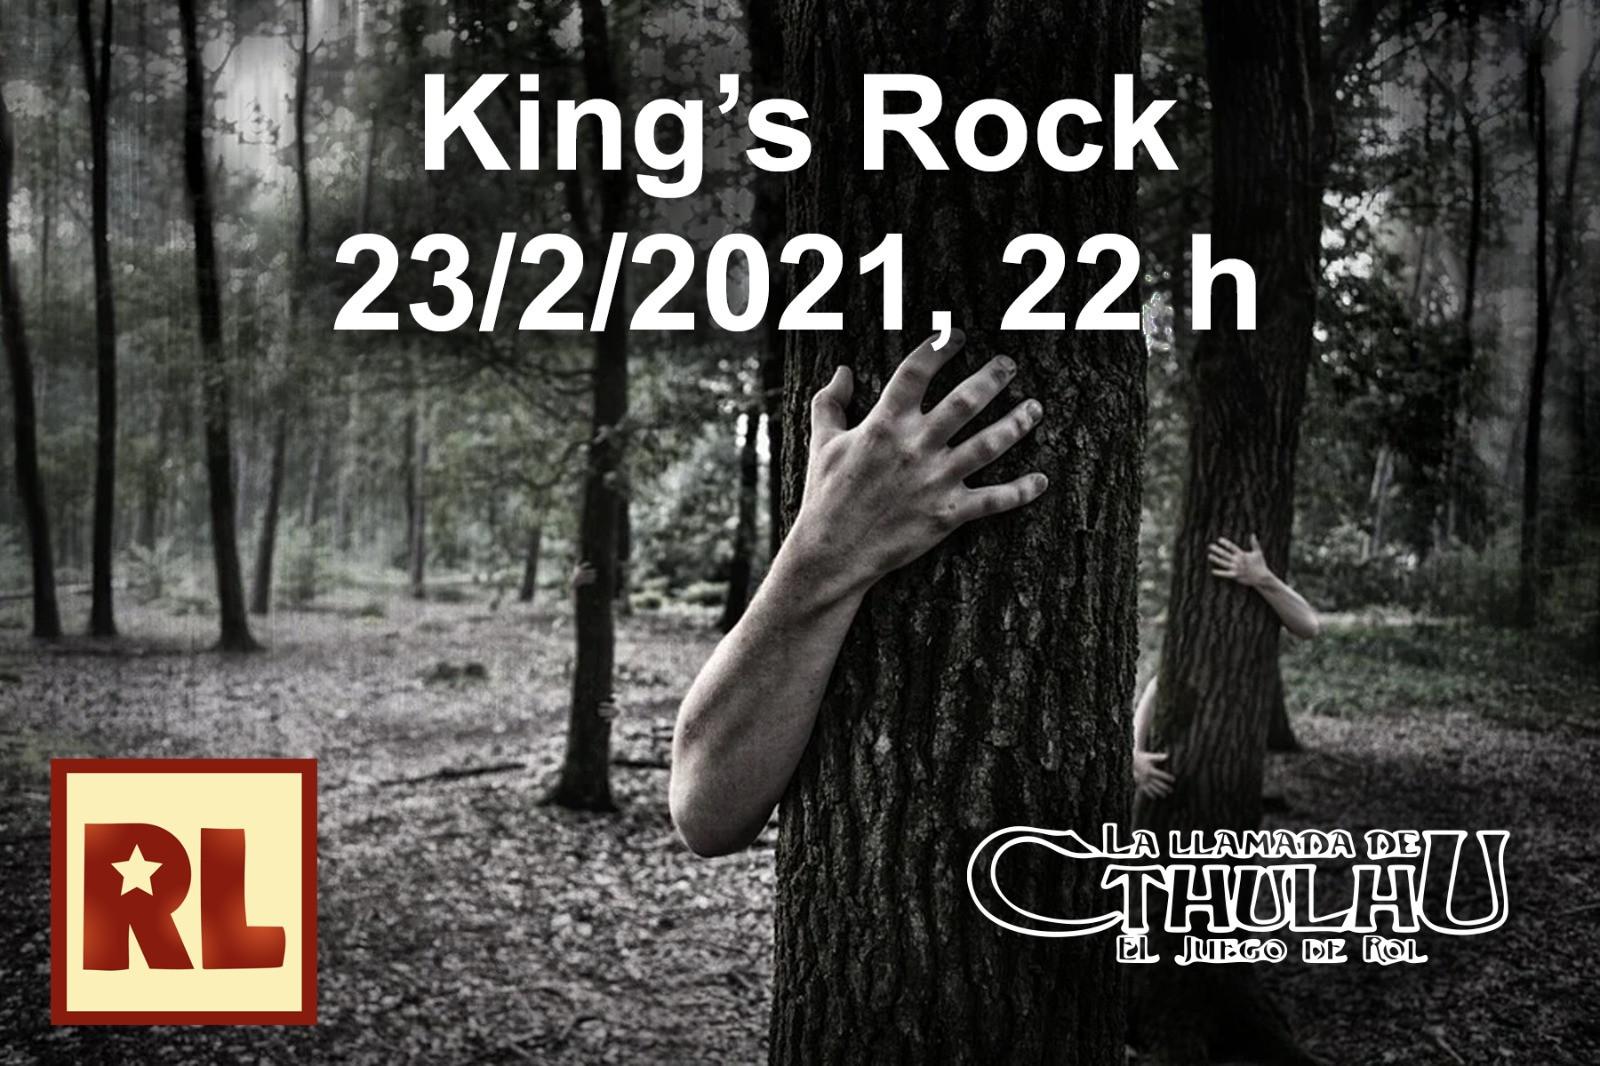 Resistencia Lúdica King's Rock (La llamada de Cthulhu)